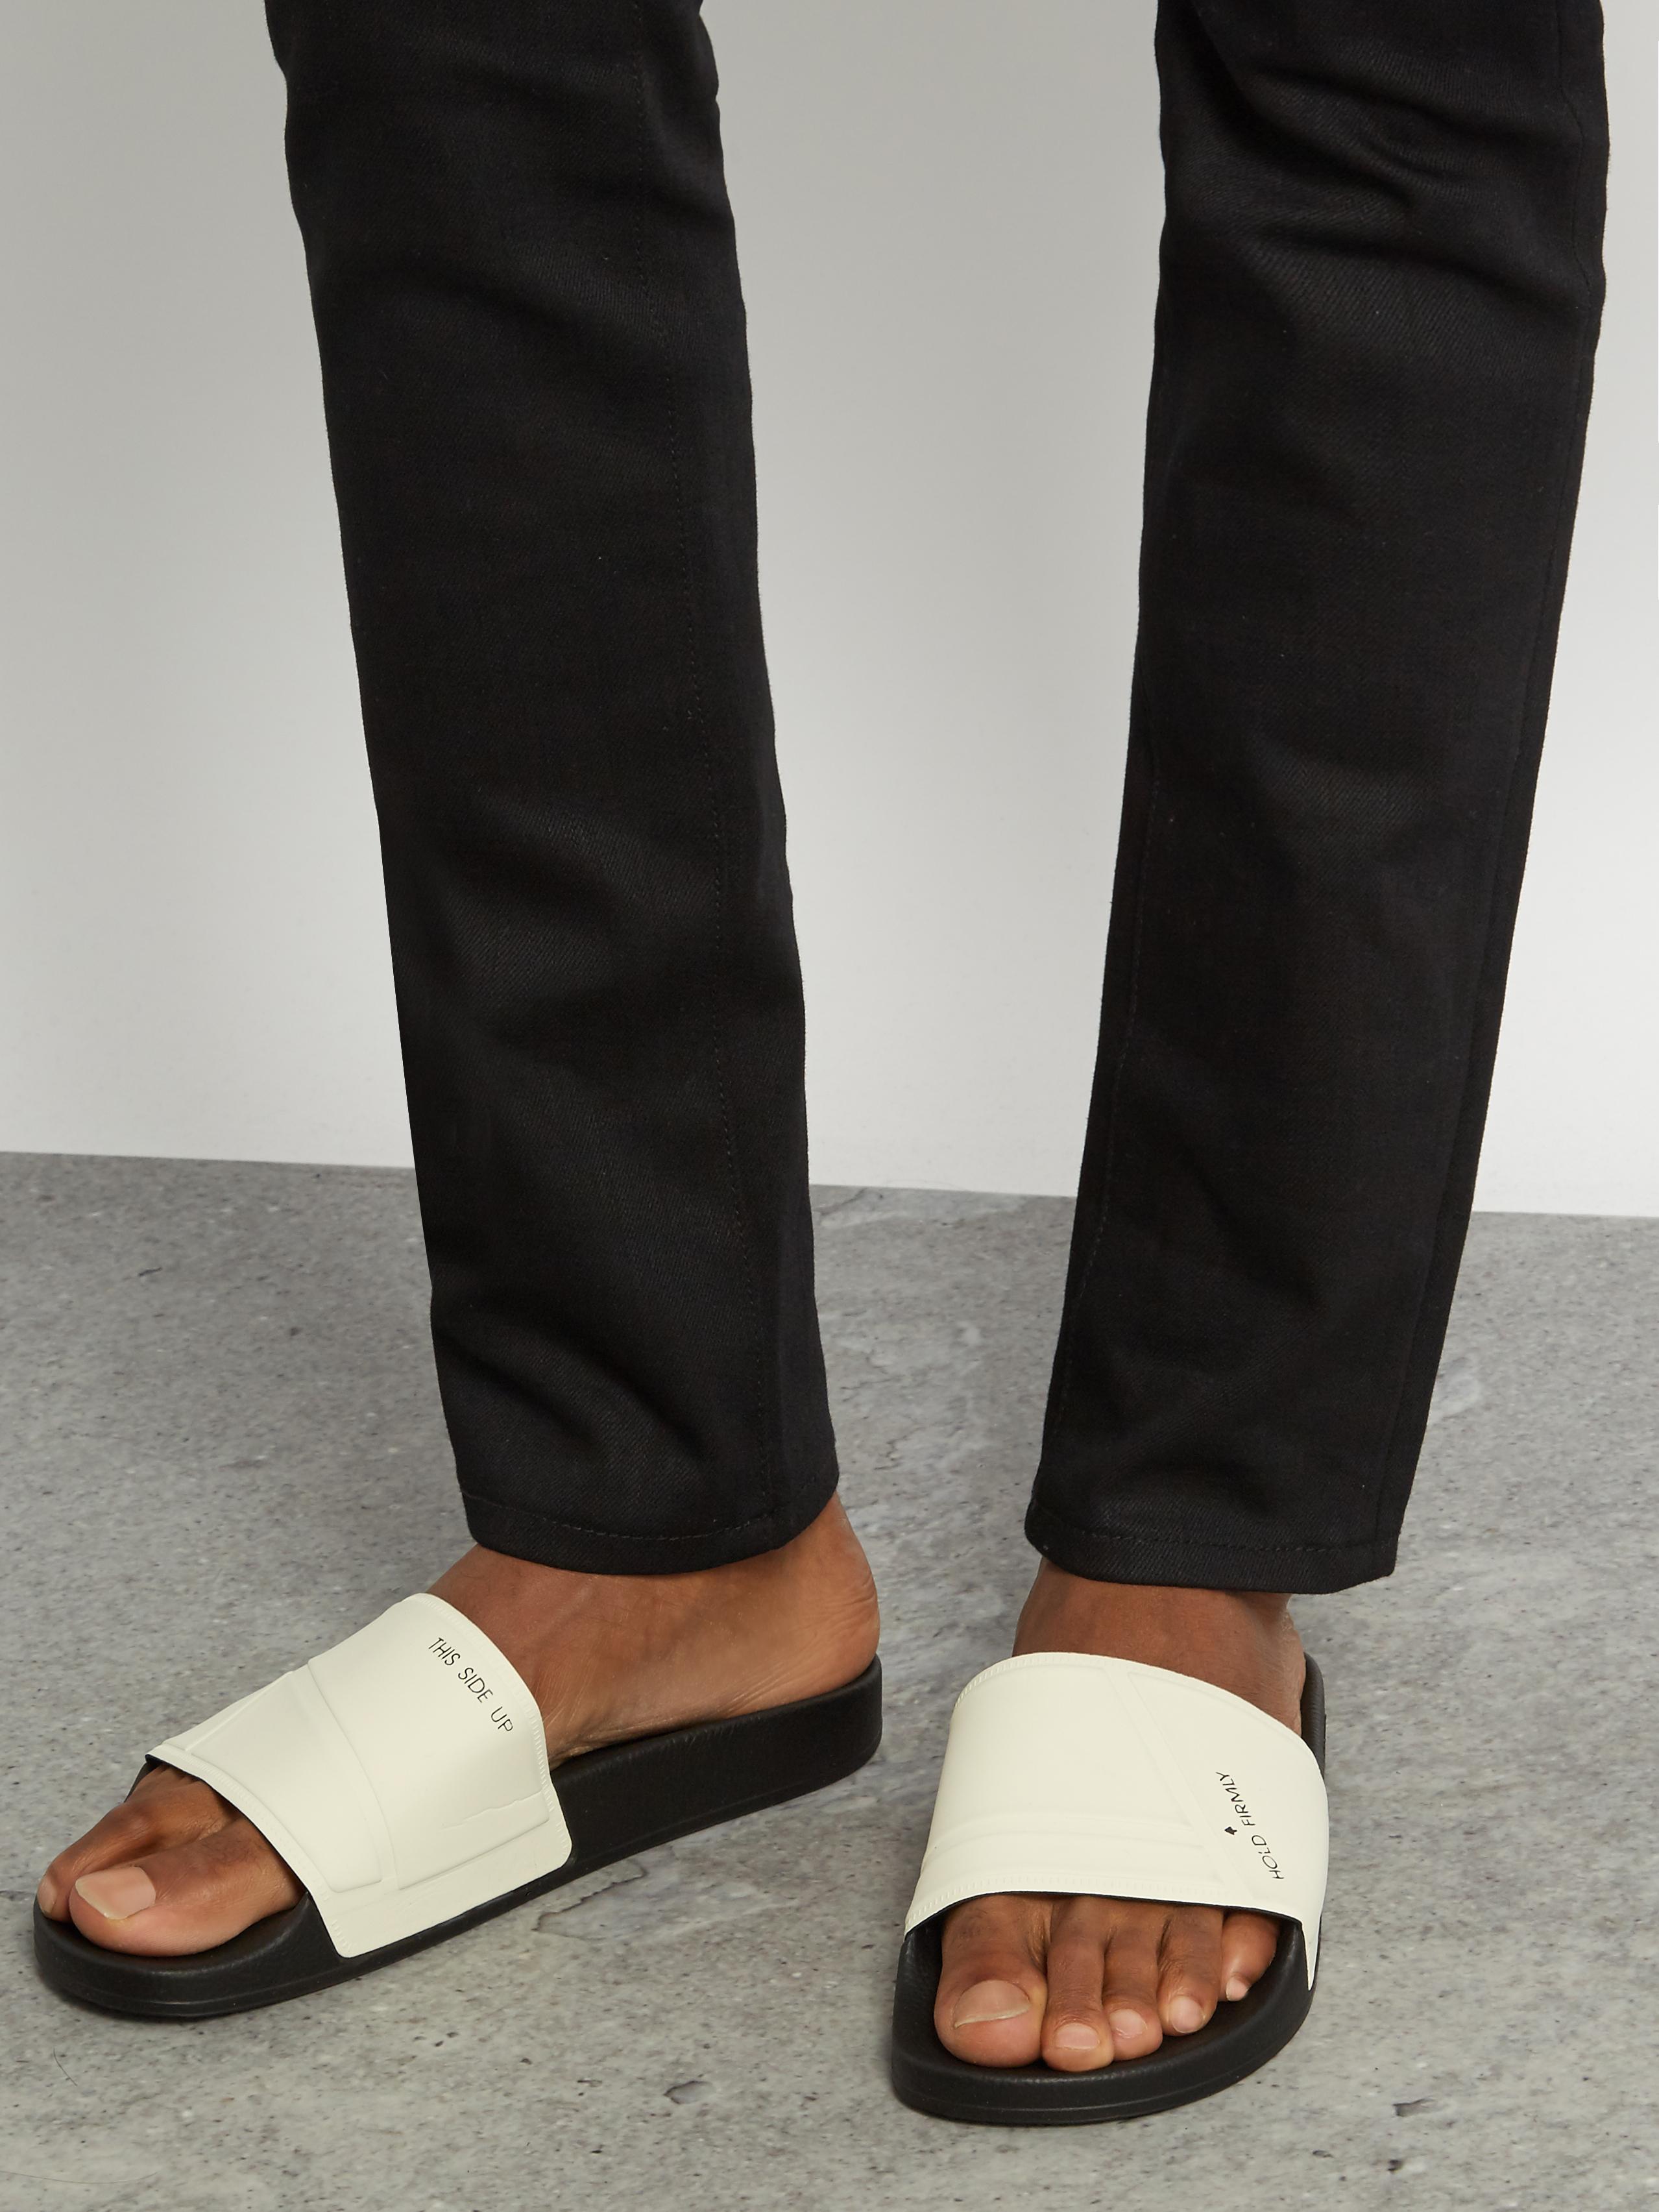 fc94c95126a2 Lyst - adidas By Raf Simons Bunny Adilette Pool Slides in Black for Men